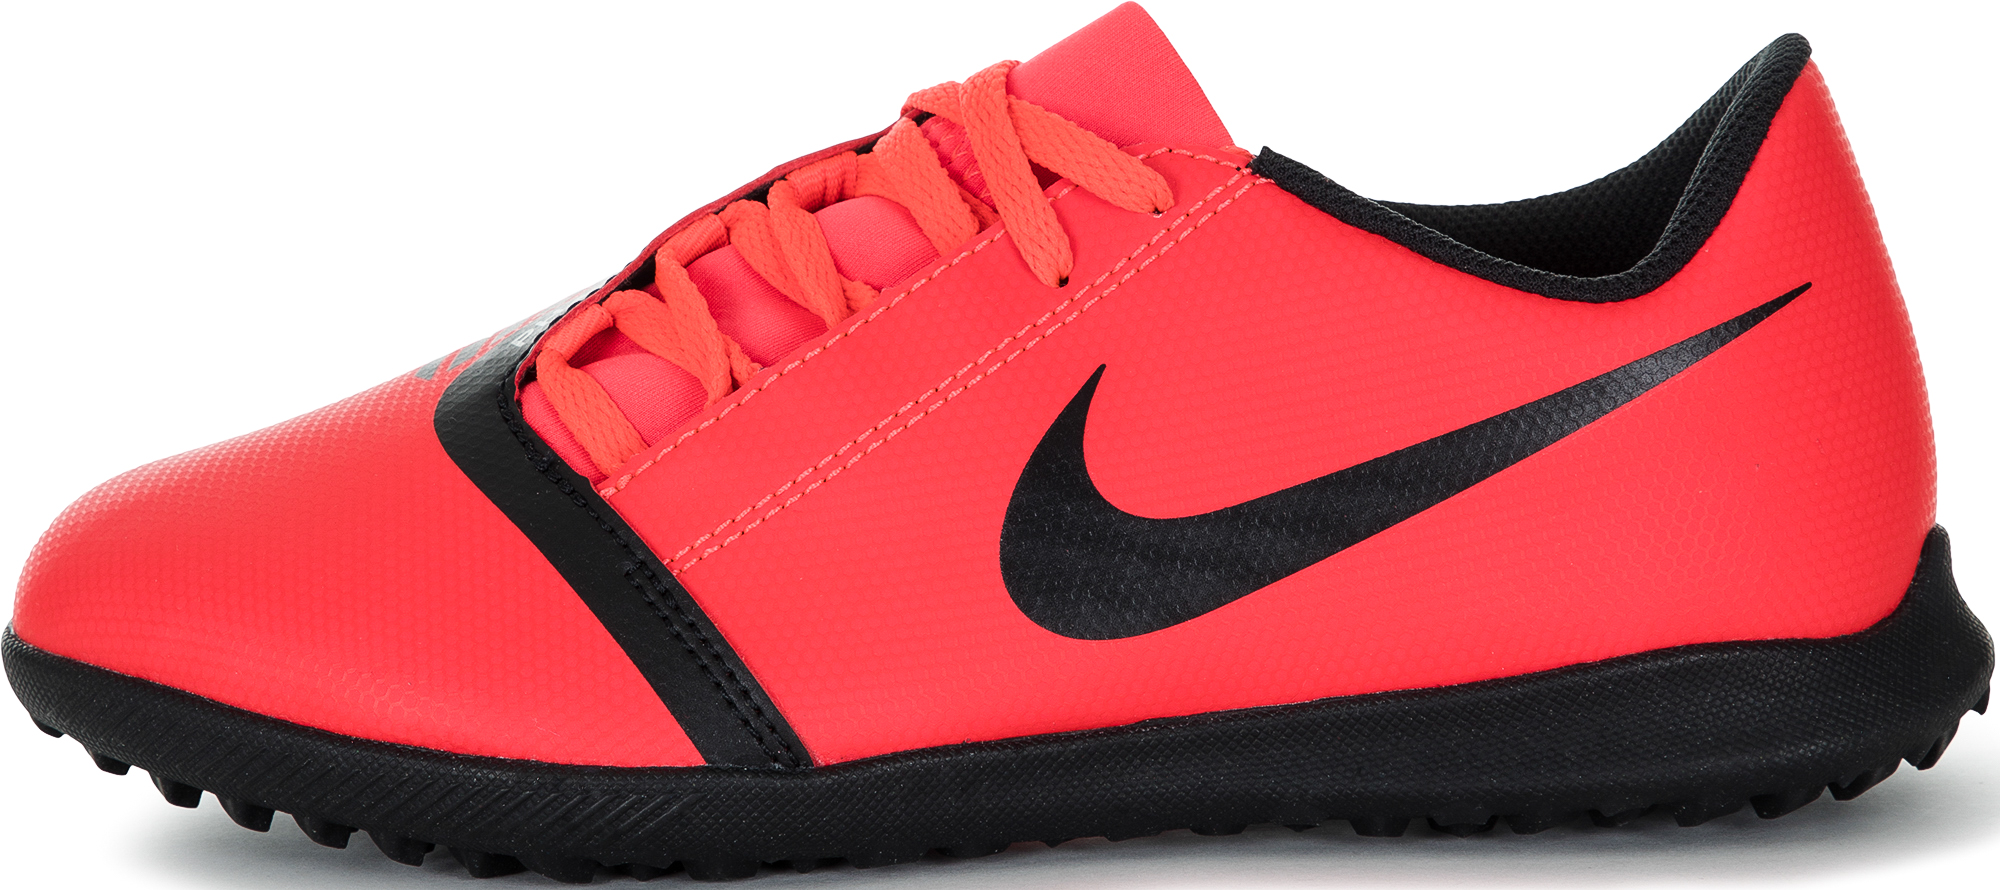 Nike Бутсы для мальчиков Nike Phantom Venom Club TF, размер 37,5